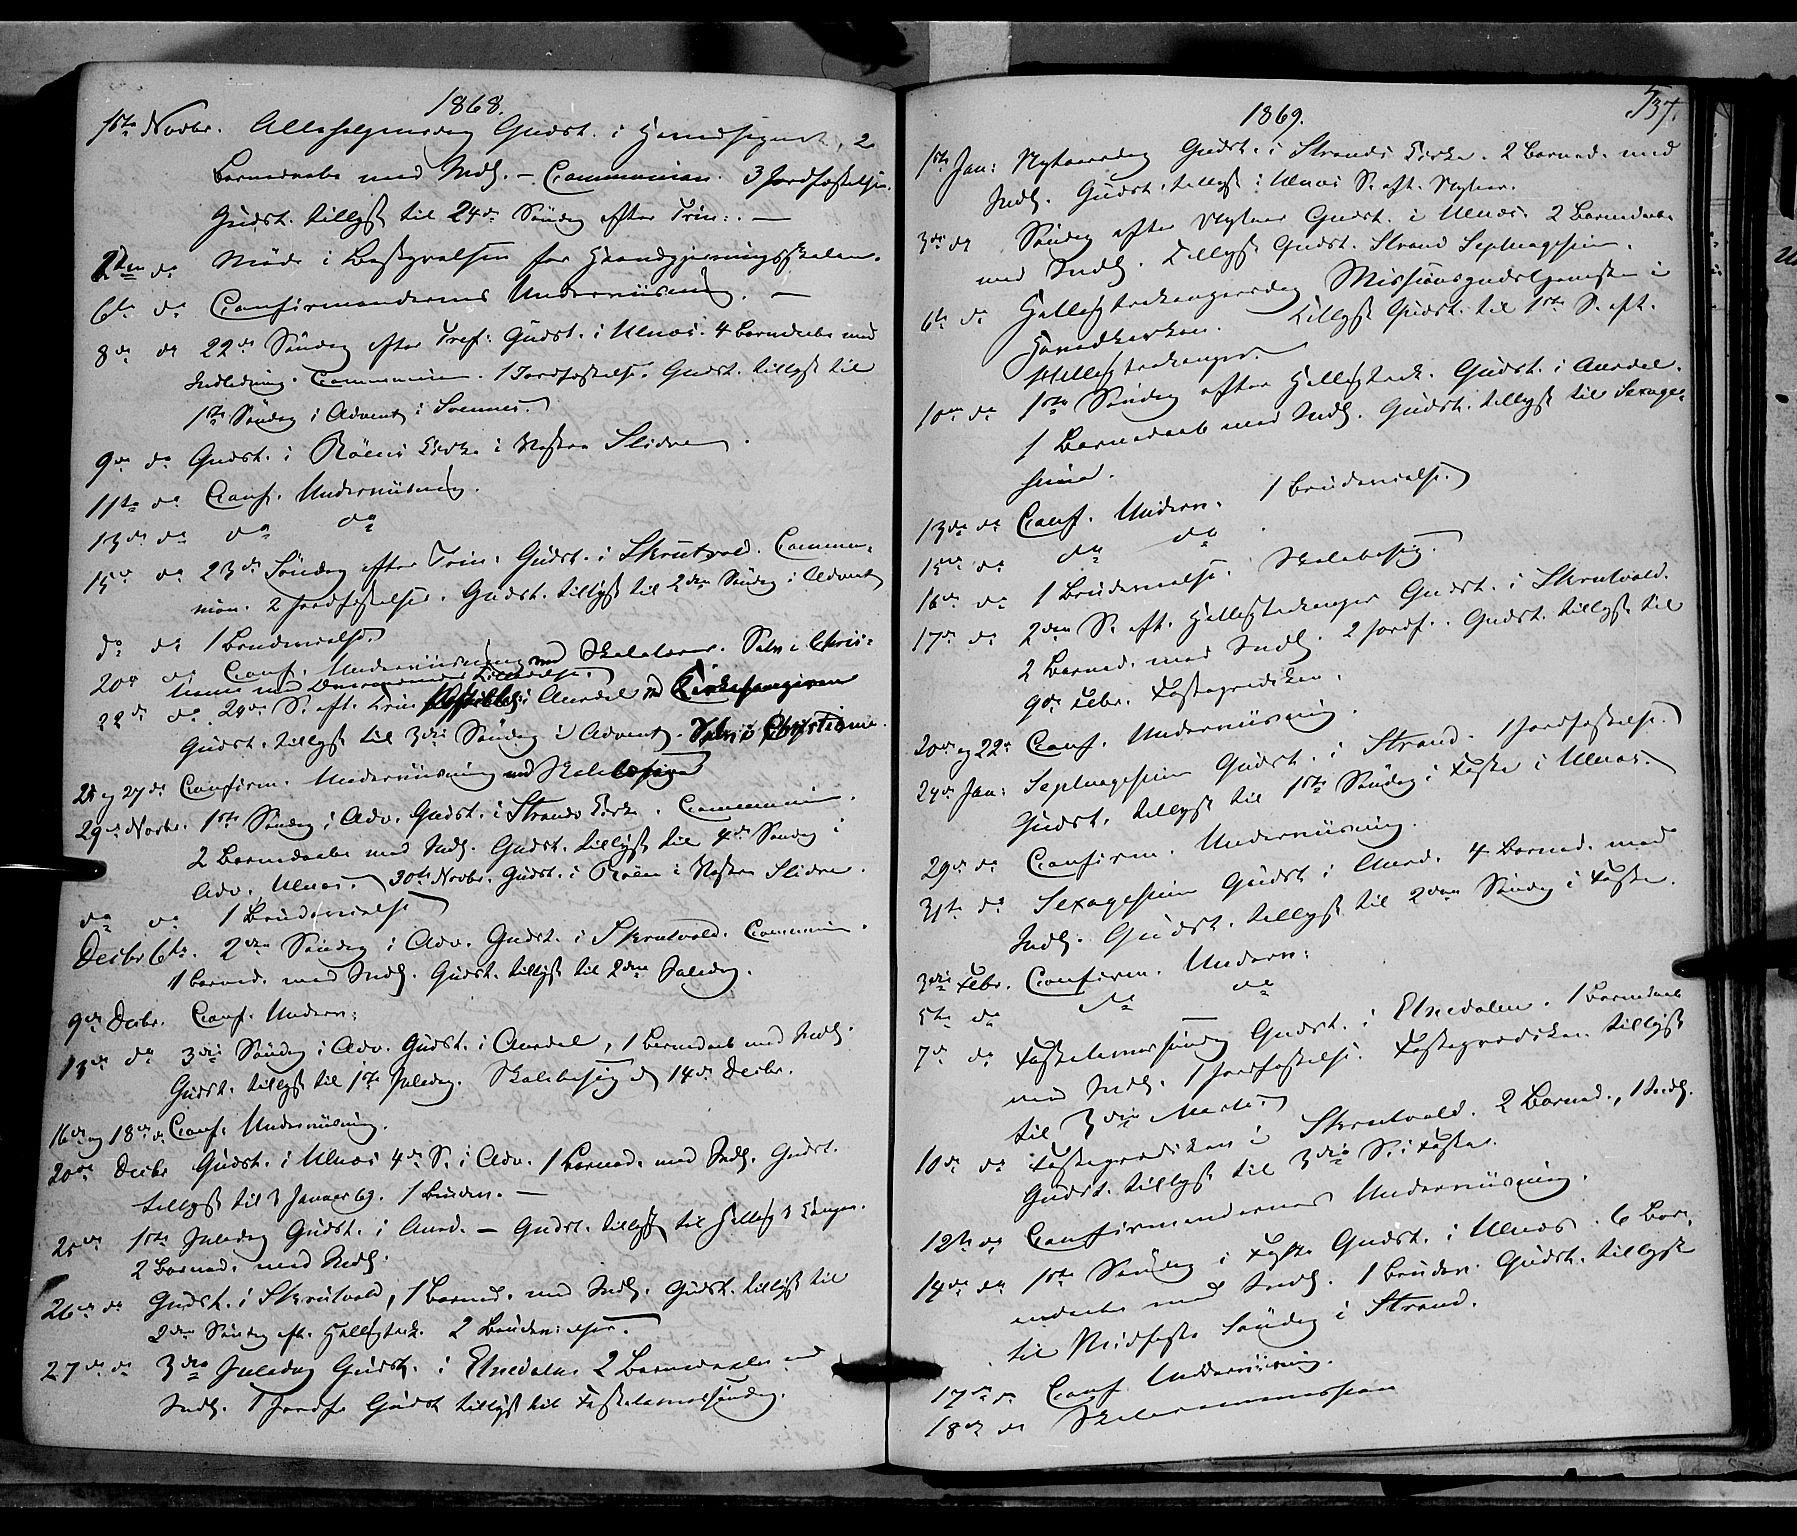 SAH, Nord-Aurdal prestekontor, Ministerialbok nr. 8, 1863-1875, s. 537